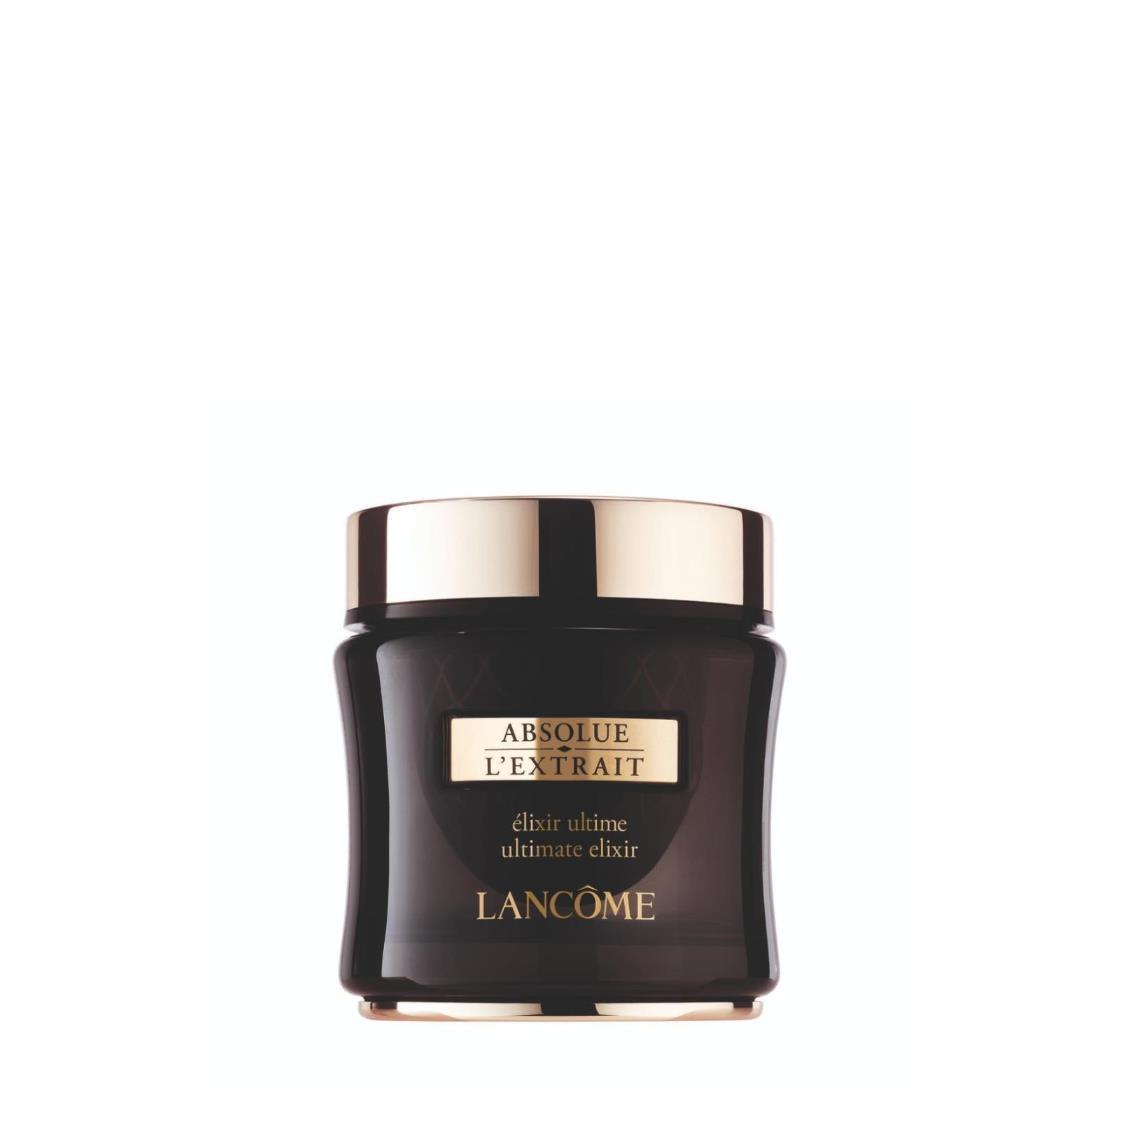 Lancome Absolue LExtrait Day Cream 50ml